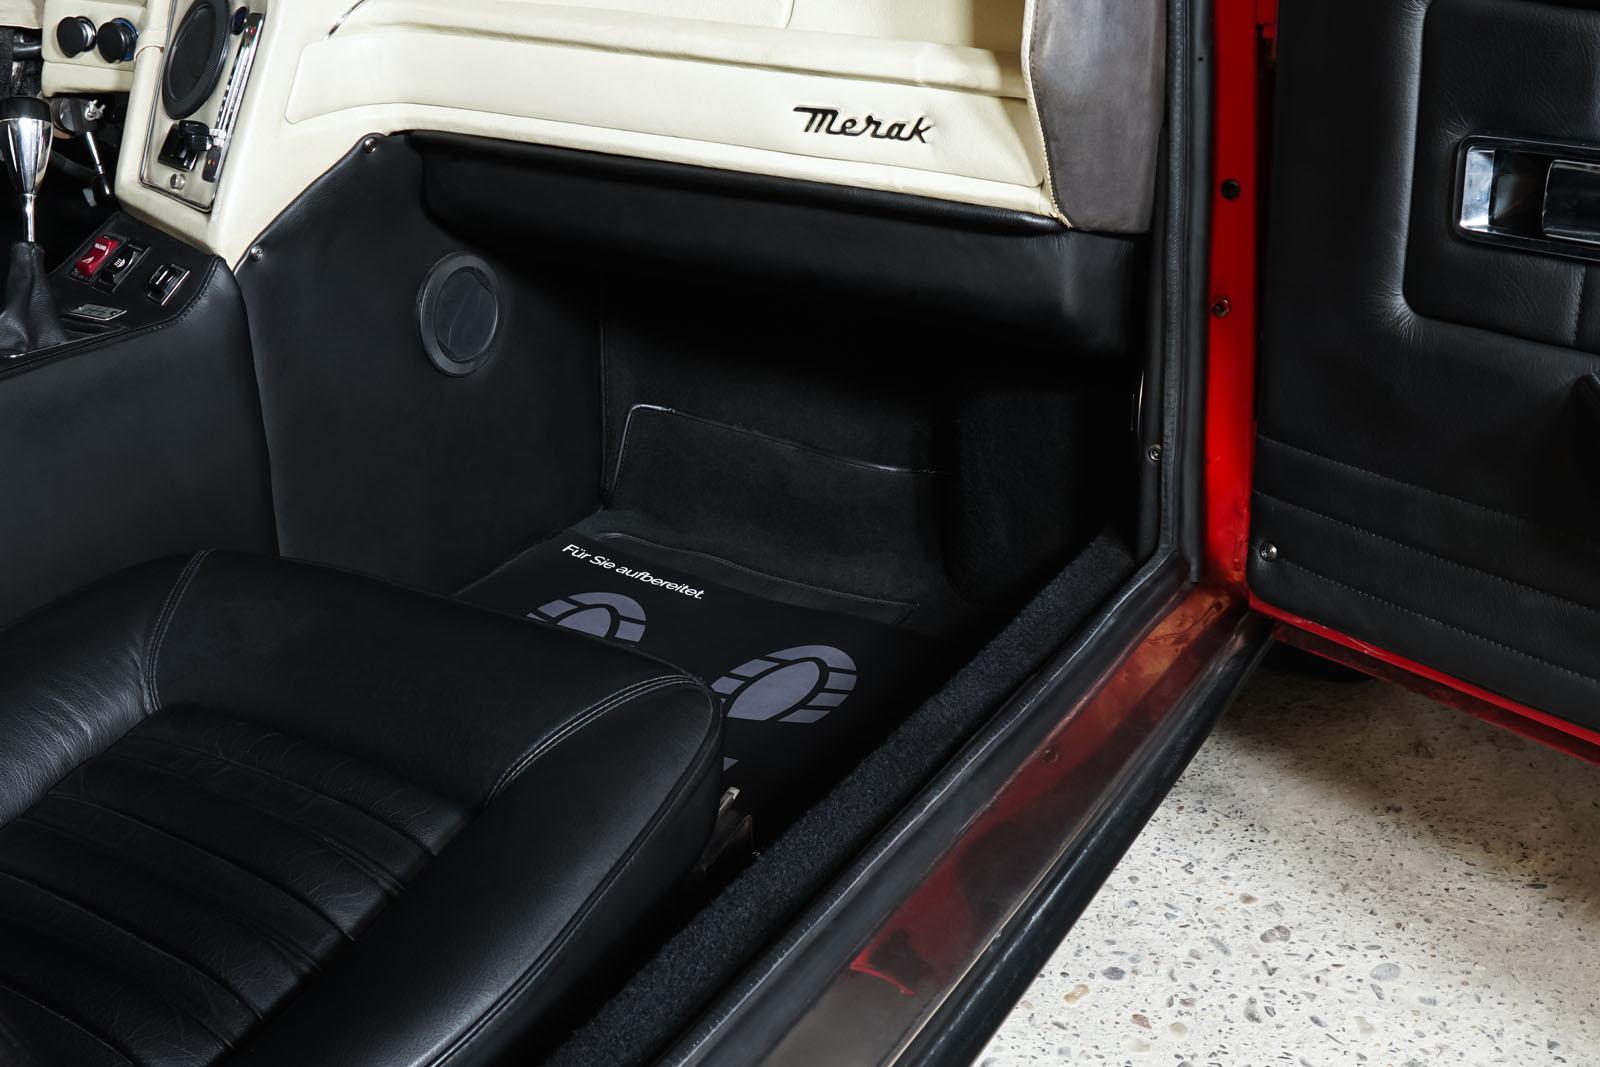 Maserati_Merak_Rot_Schwarz_MAS-4094_17_w